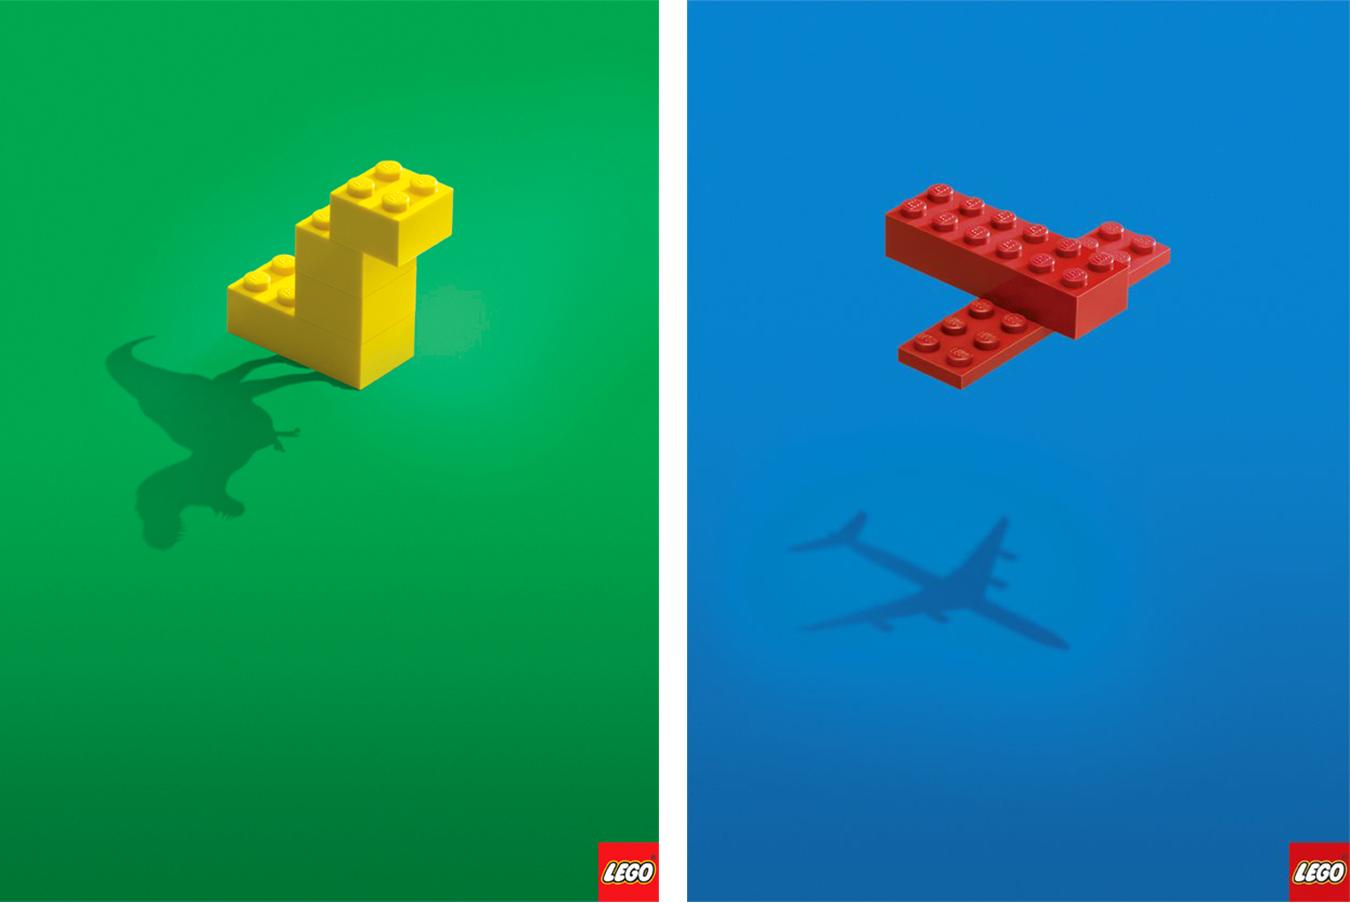 lego-minimal-ads.png